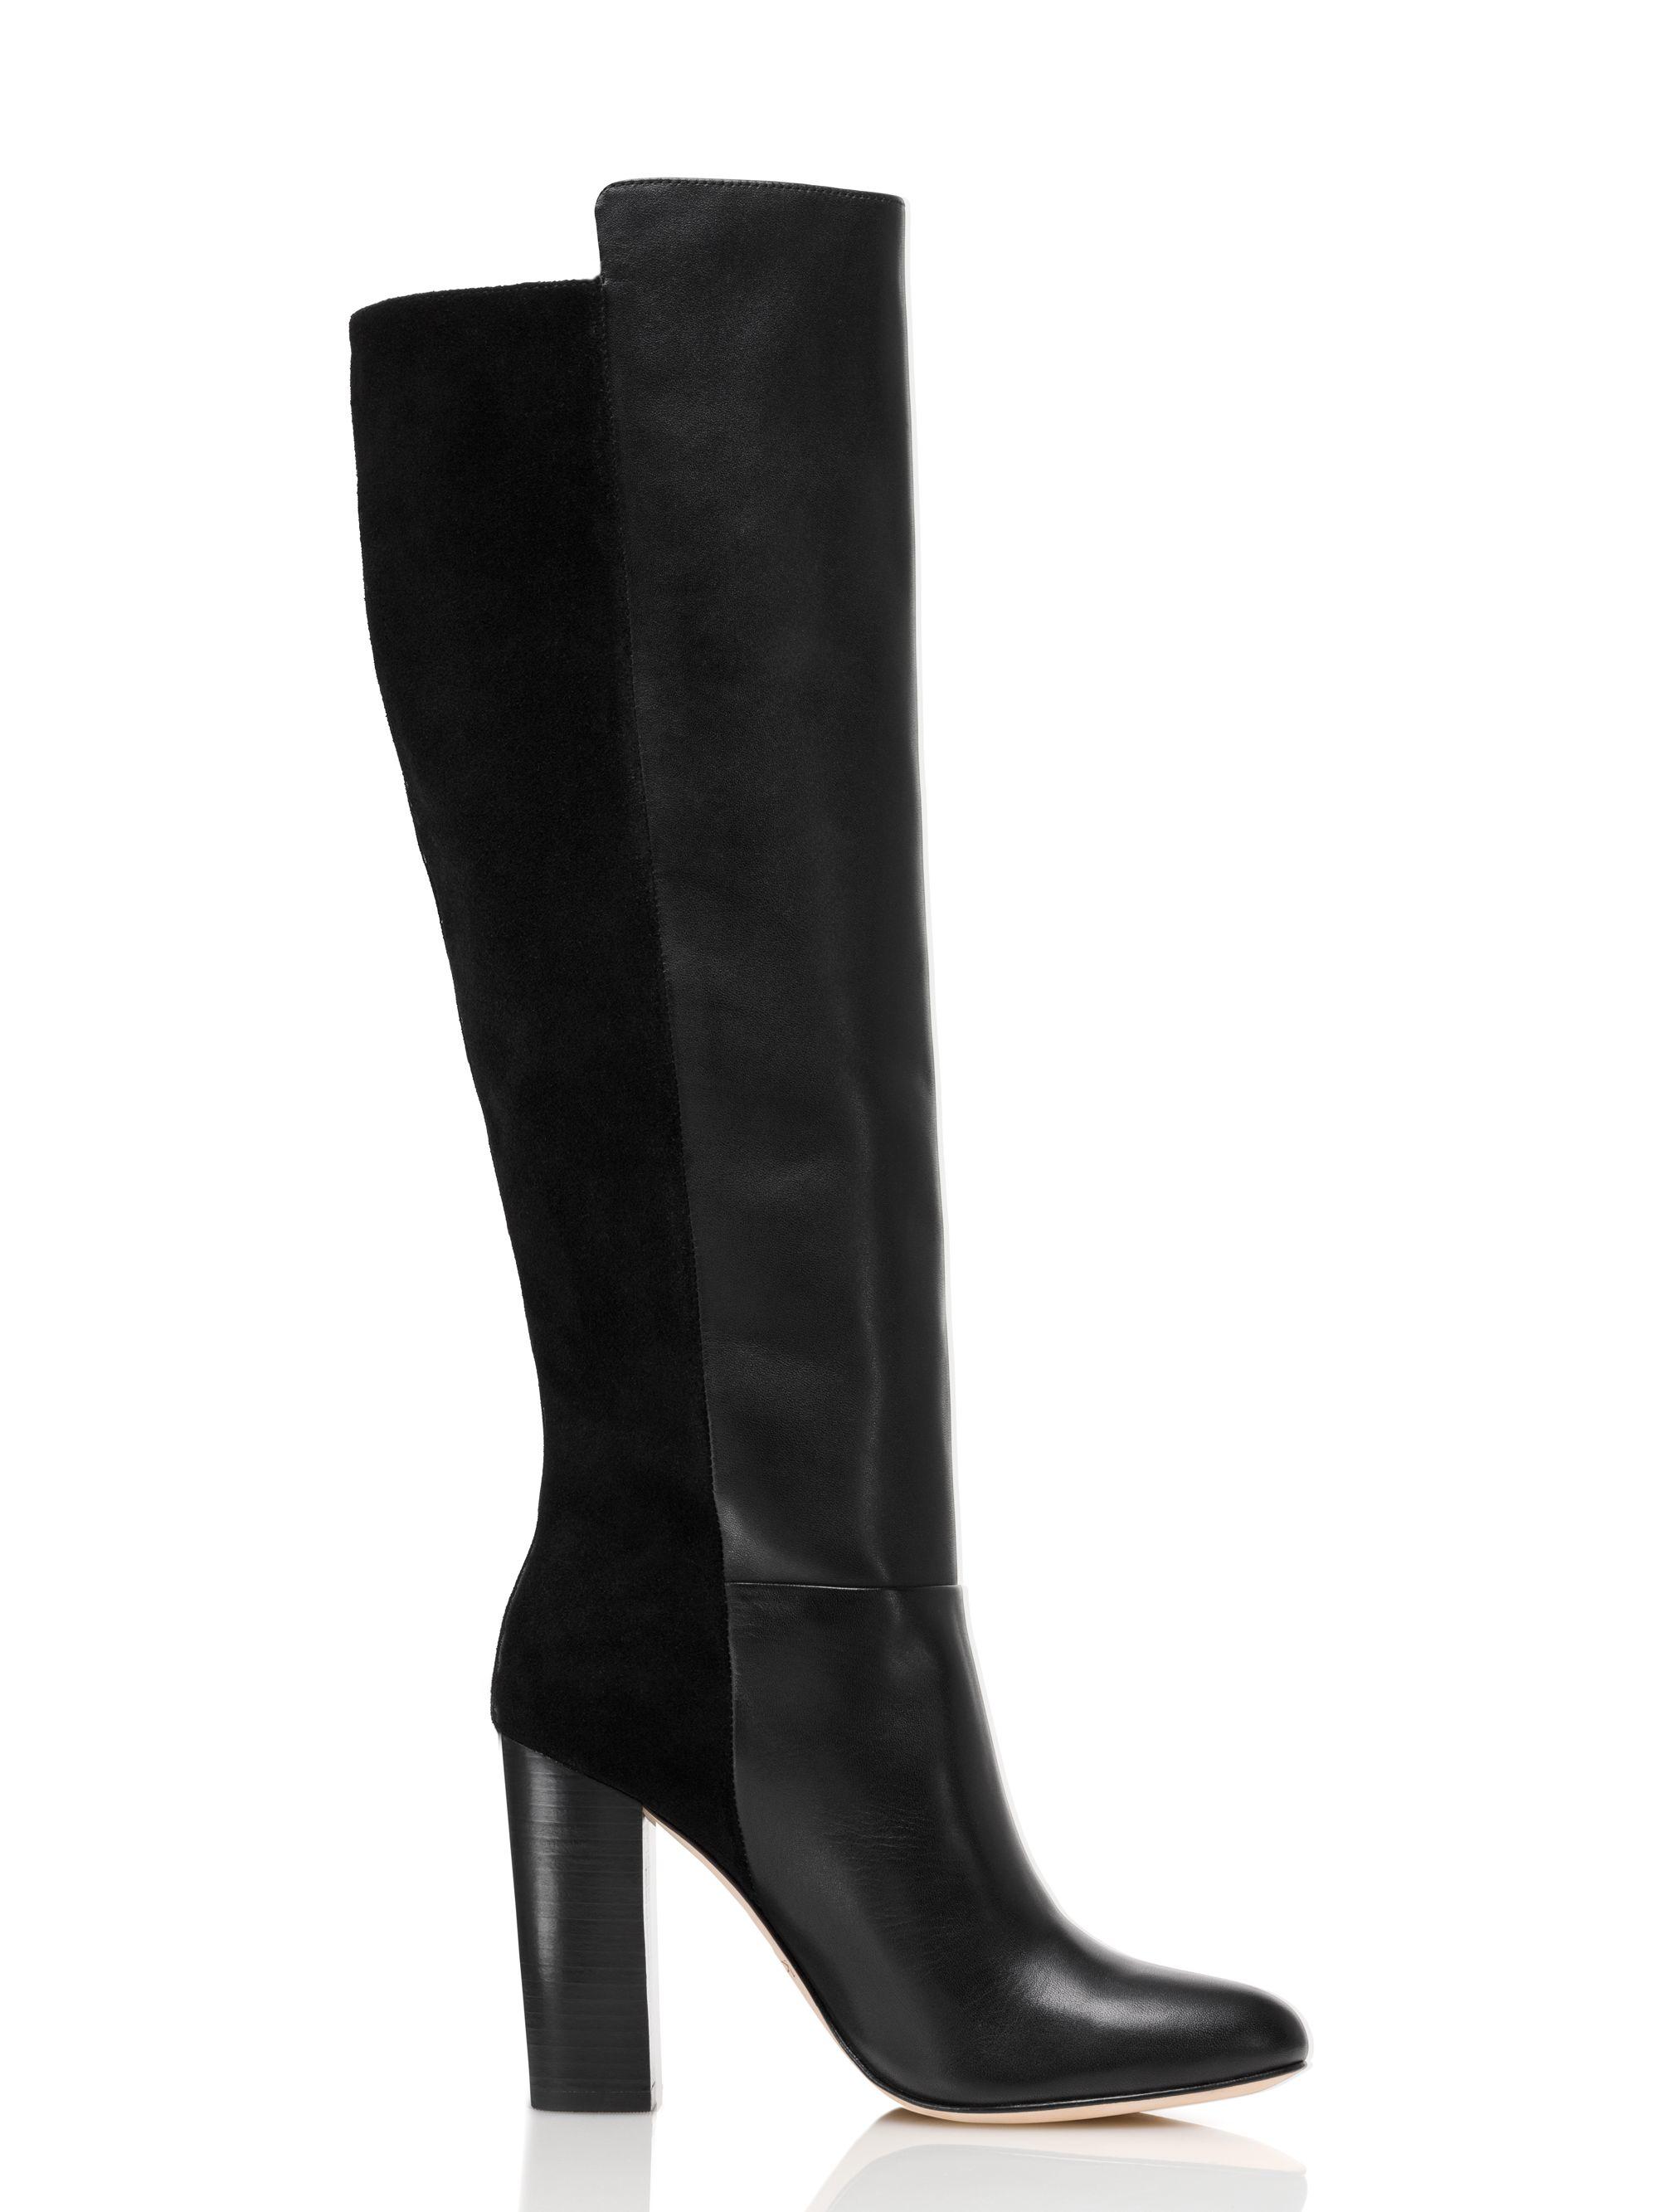 Kate Spade Shoes Uk